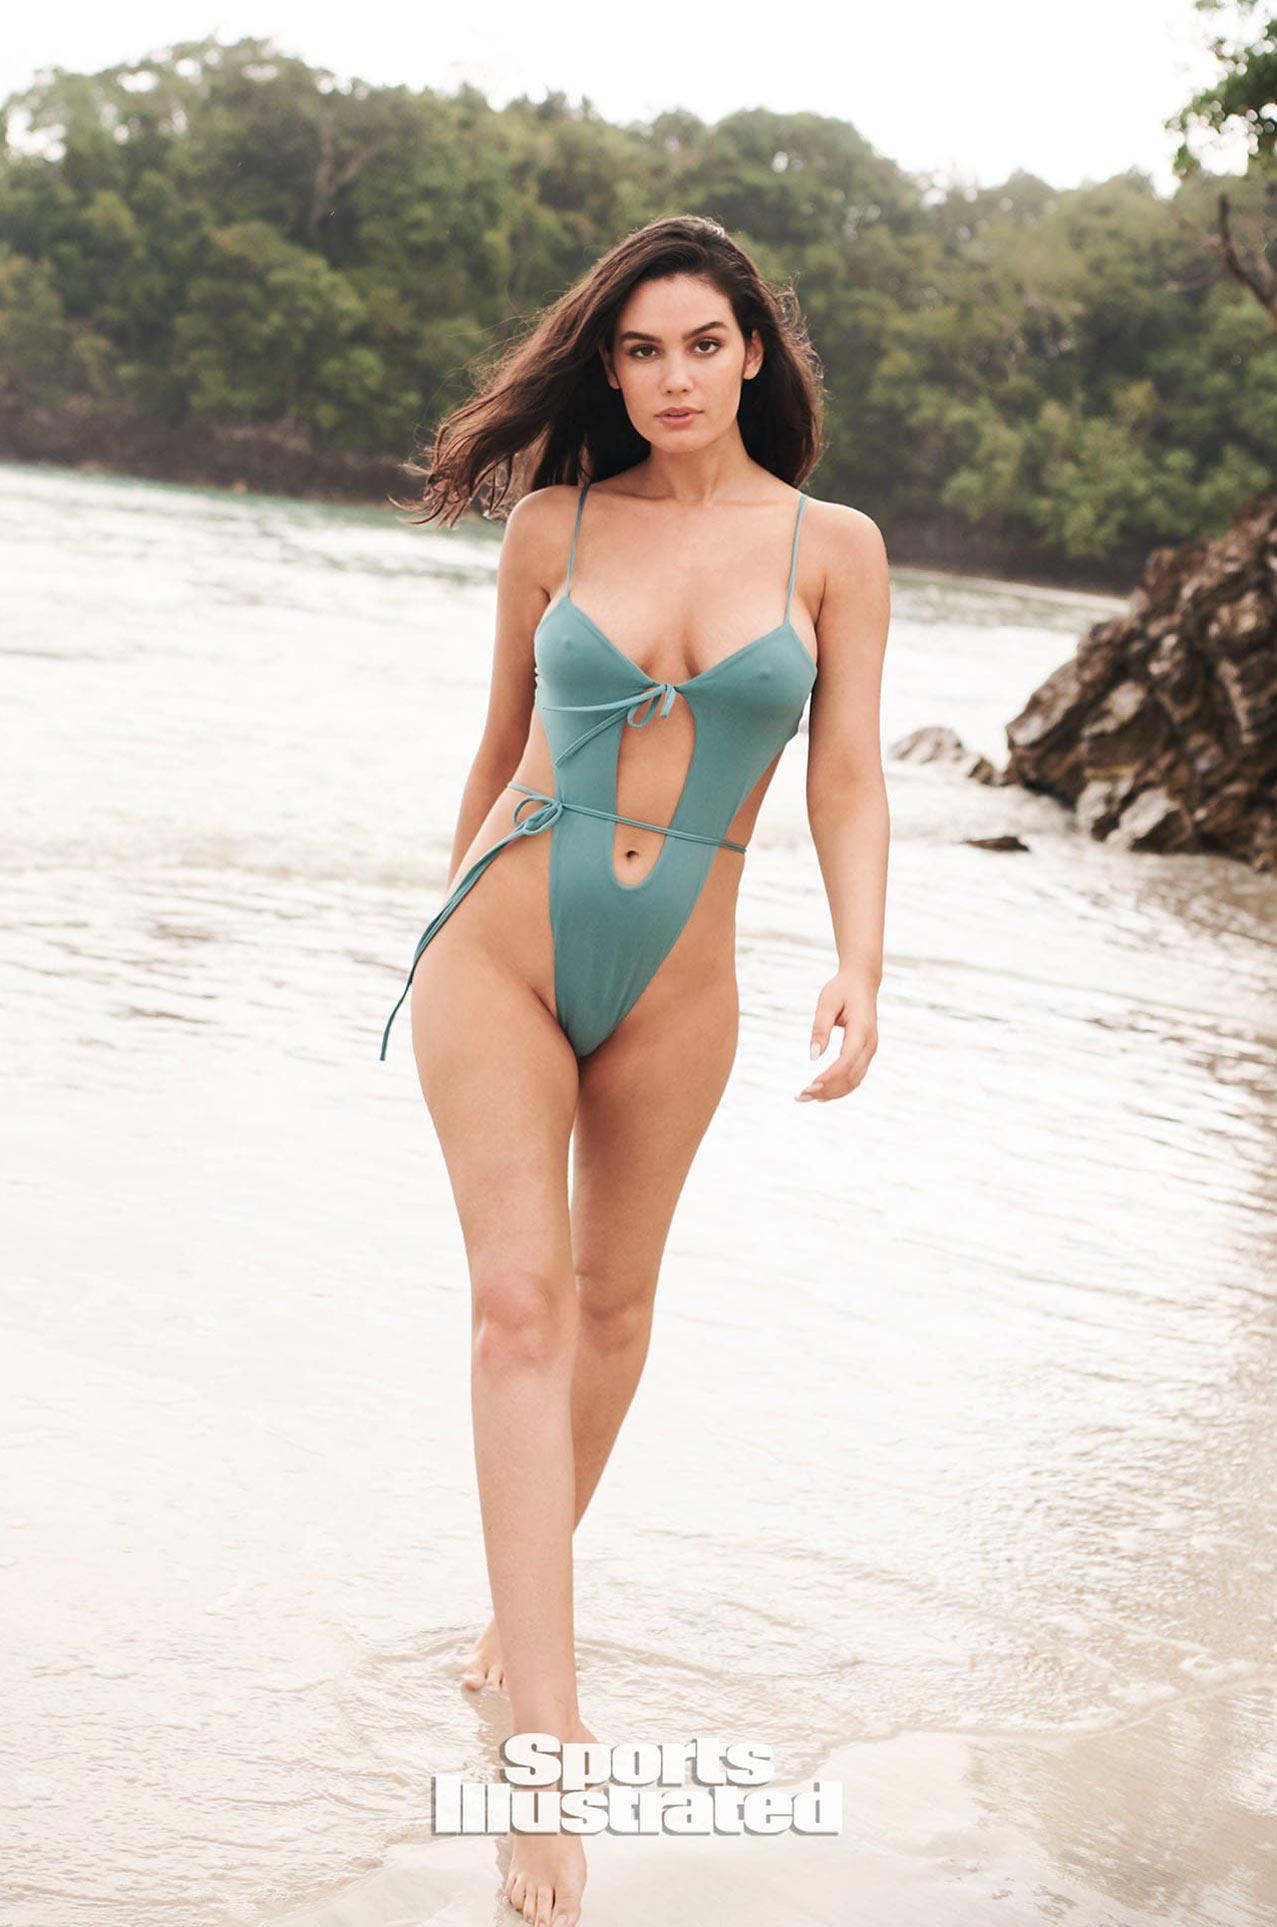 Энн де Паула в каталоге купальников Sports Illustrated Swimsuit 2020 / фото 20